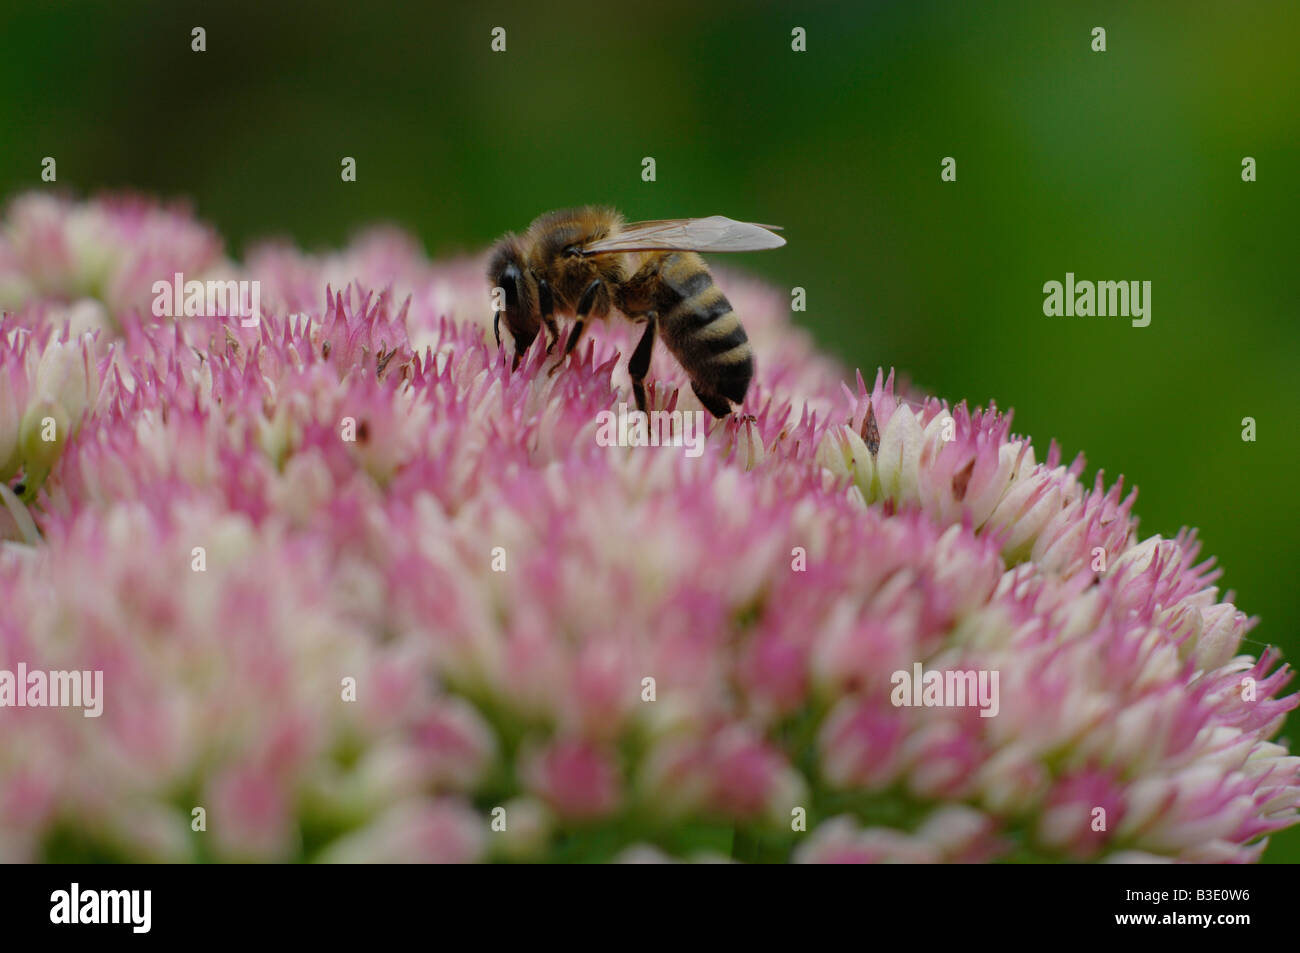 Bee on Sedum flower - Stock Image